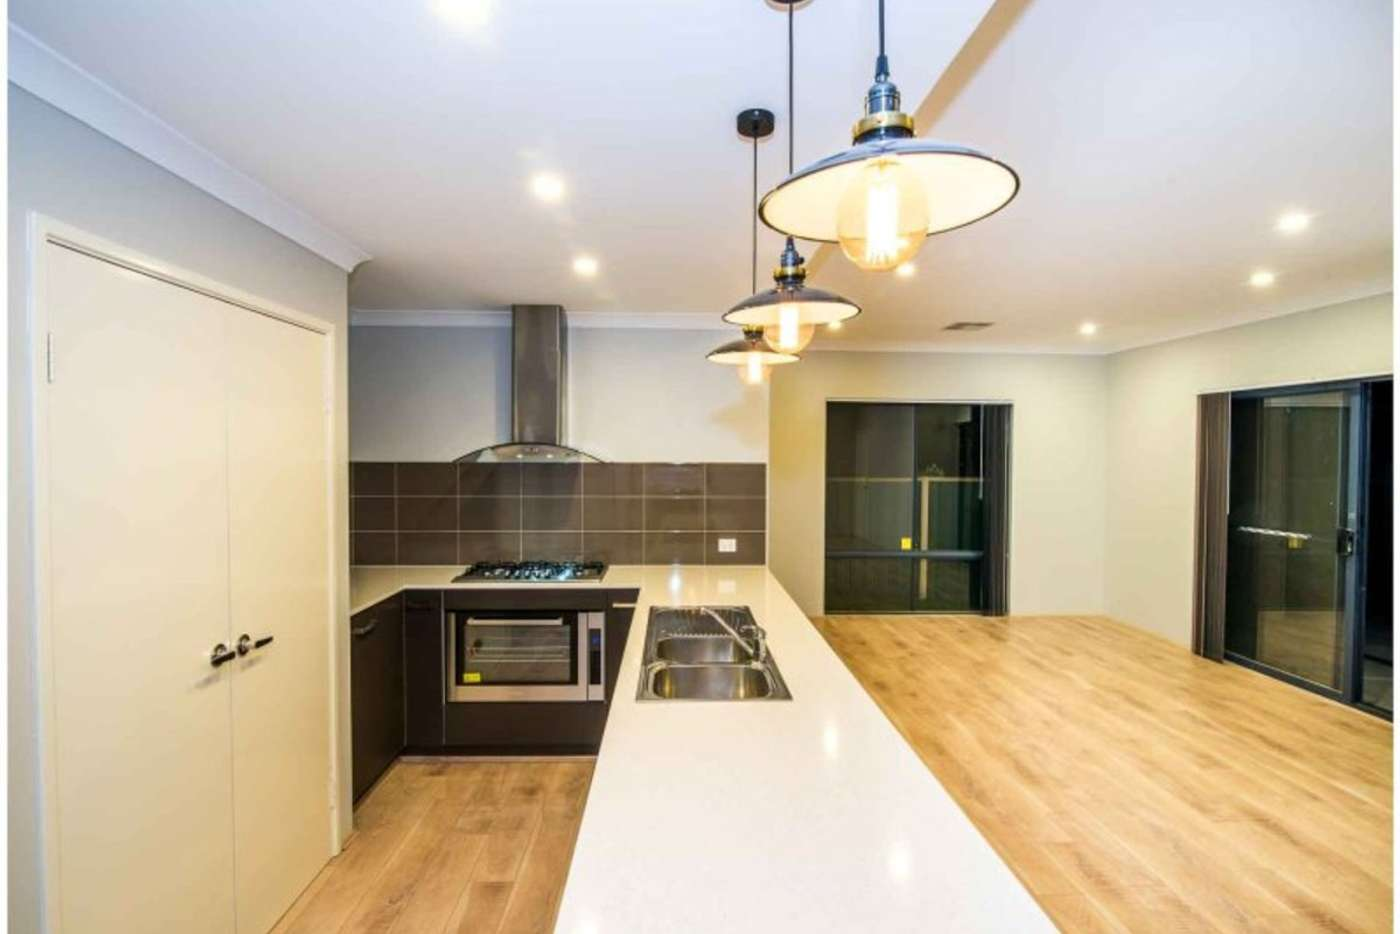 Main view of Homely house listing, 59B Helm Street, Maddington WA 6109